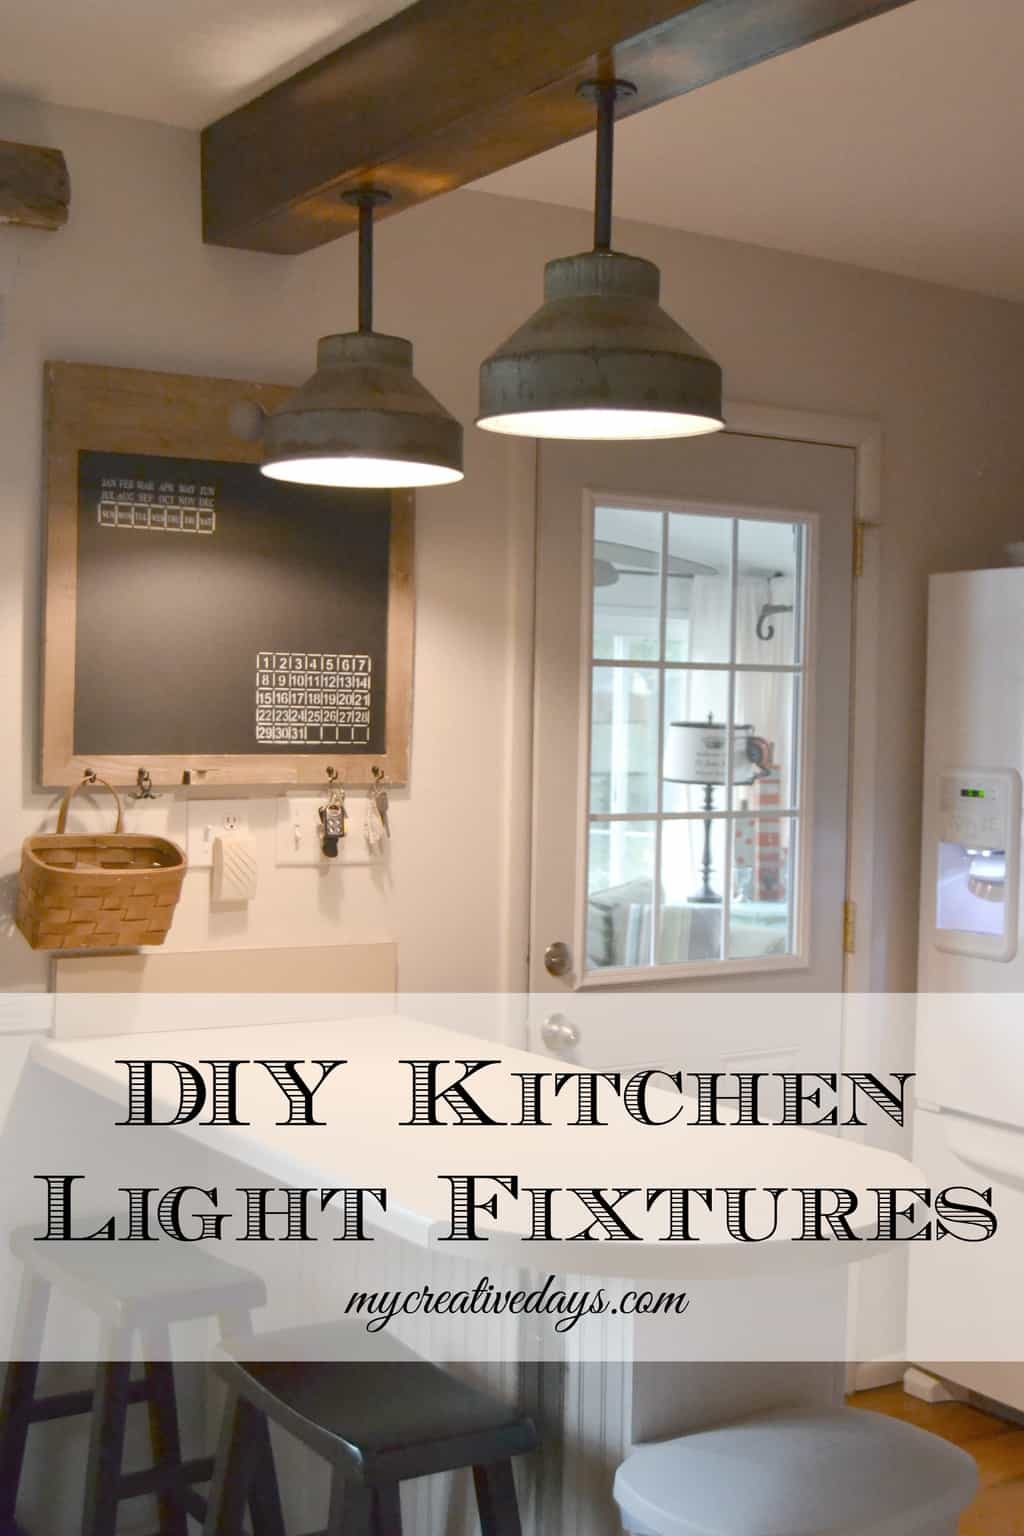 diy kitchen light fixtures part 2 kitchen light fixture Pin this DIY Kitchen Light Fixtures Part 2 mycreativedays com